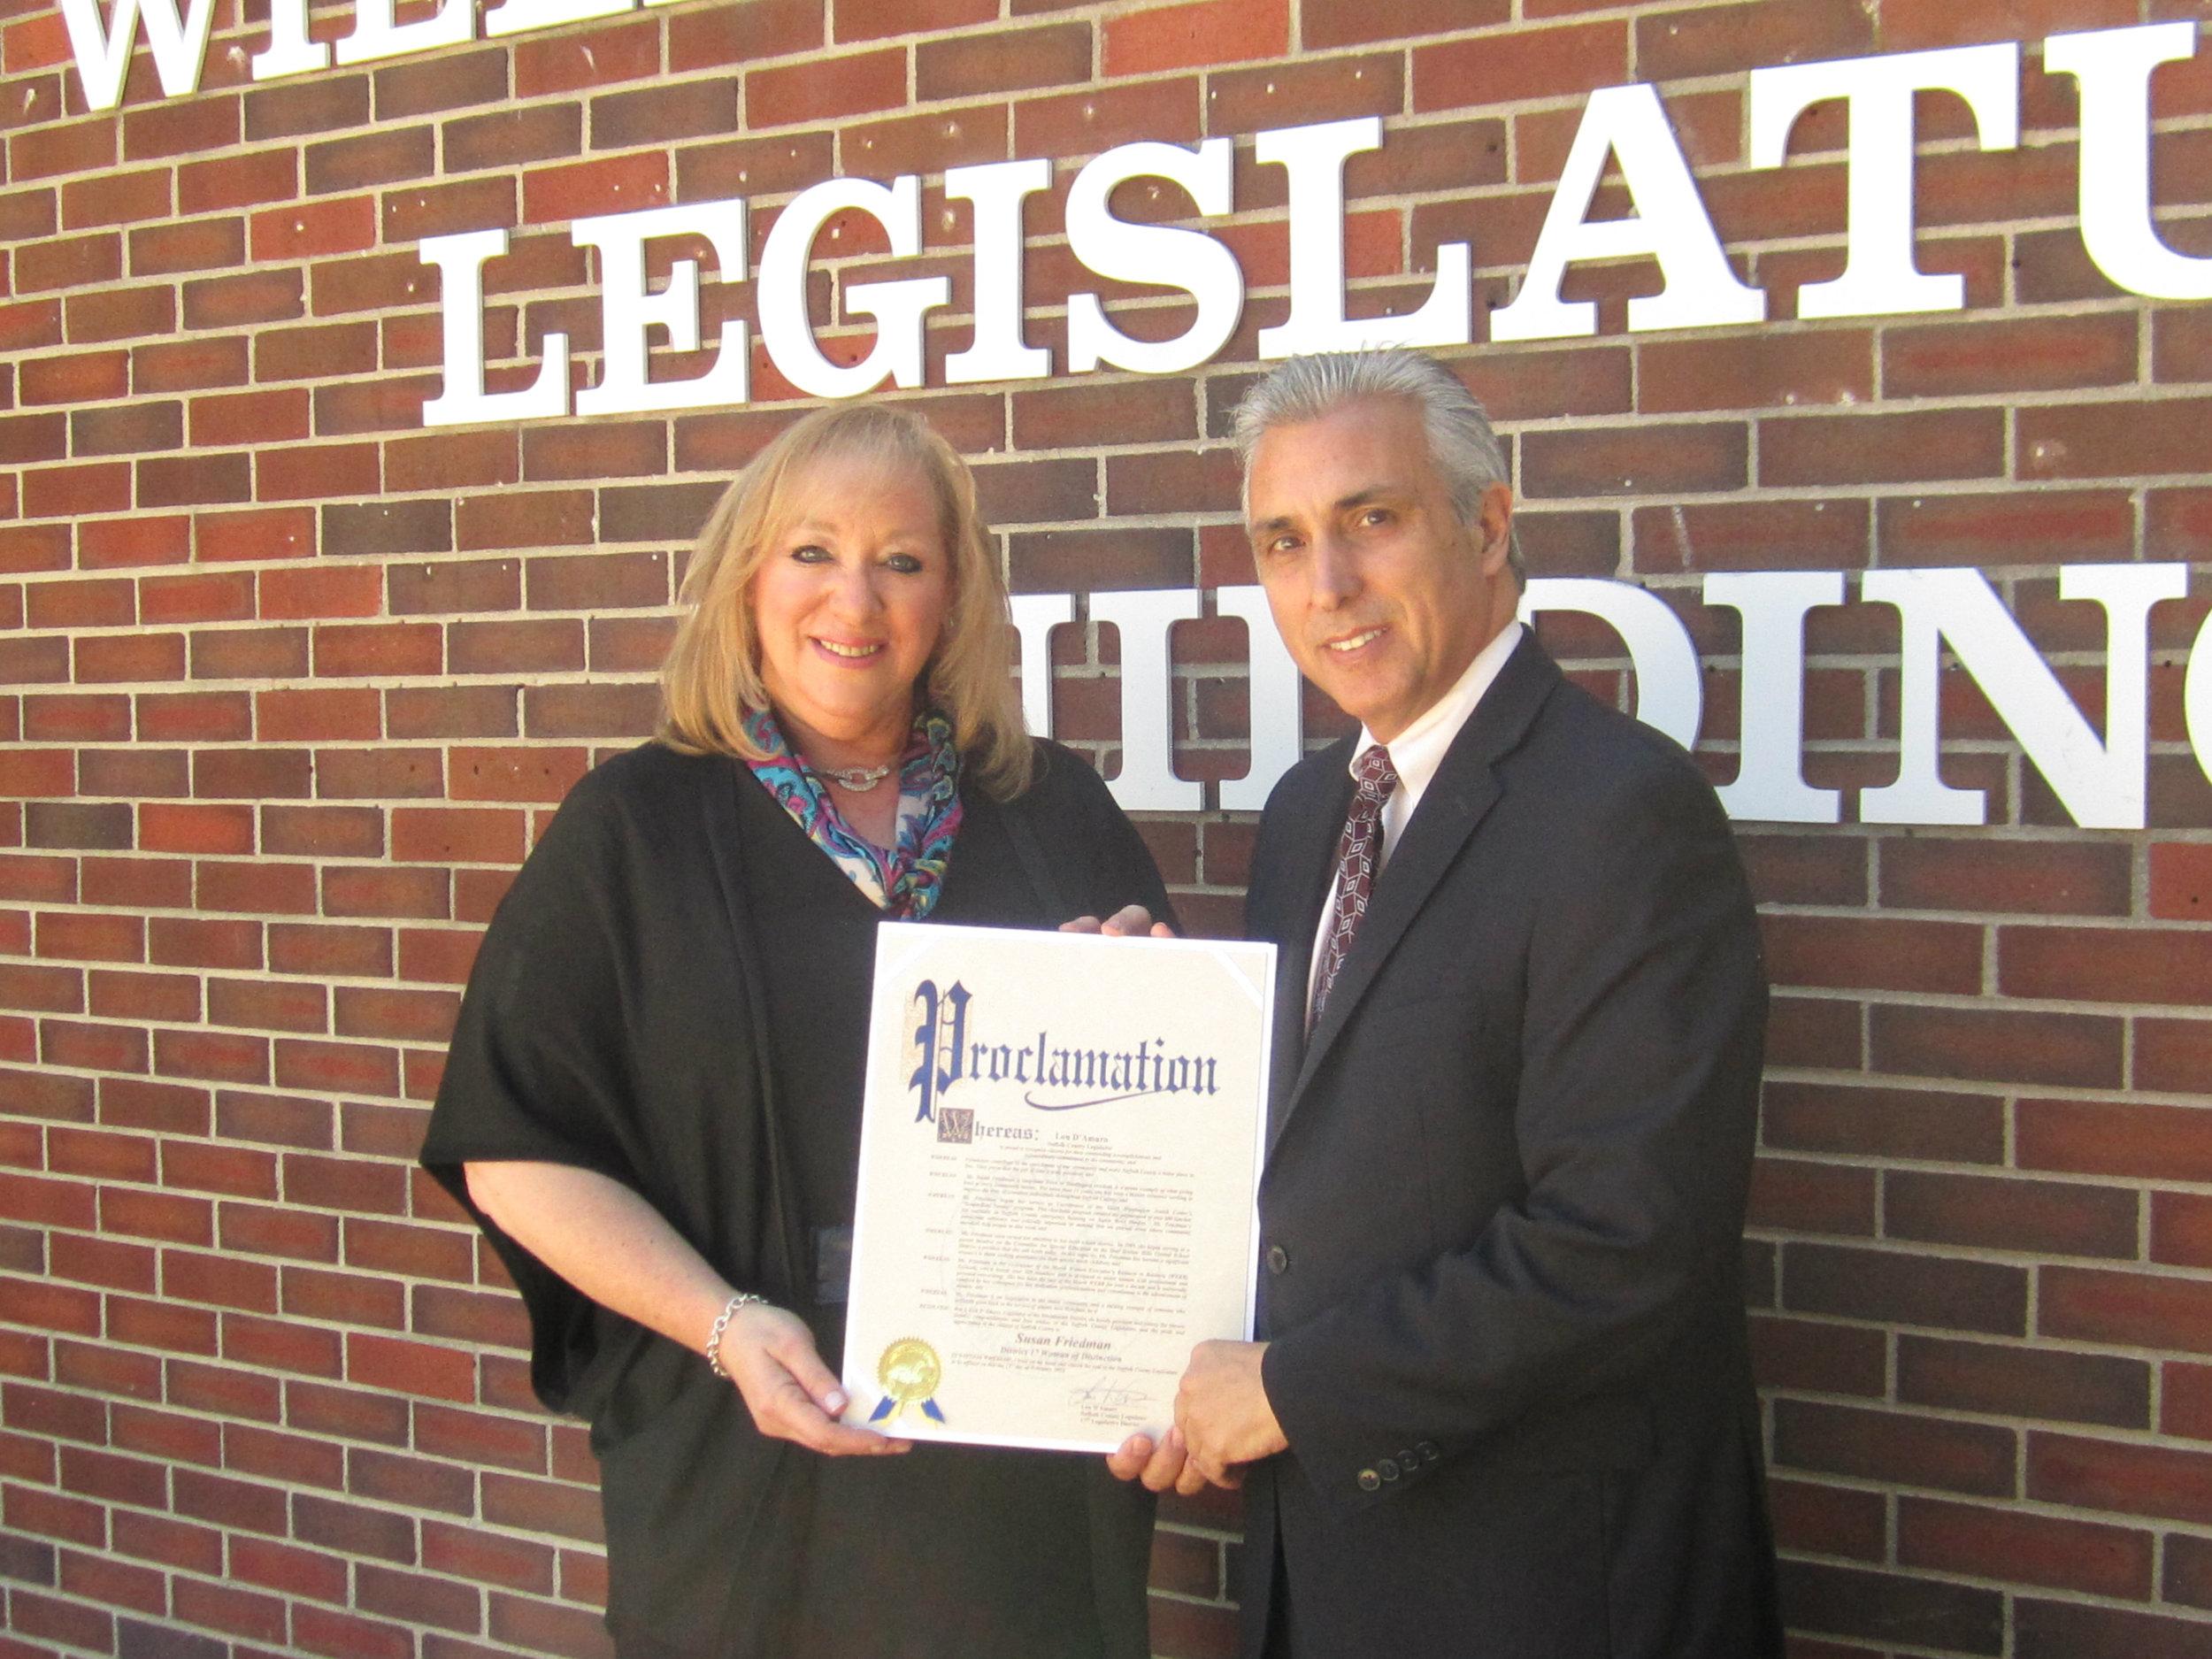 Suffolk   County Legislator Lou D'Amaro (D-Huntington Station) has selected longtime Dix Hills resident Susan Friedman as the 2016 woman of distinction for Suffolk's 17th legislative district. Photo courtesy of Legislator Lou D'Amaro's offic e